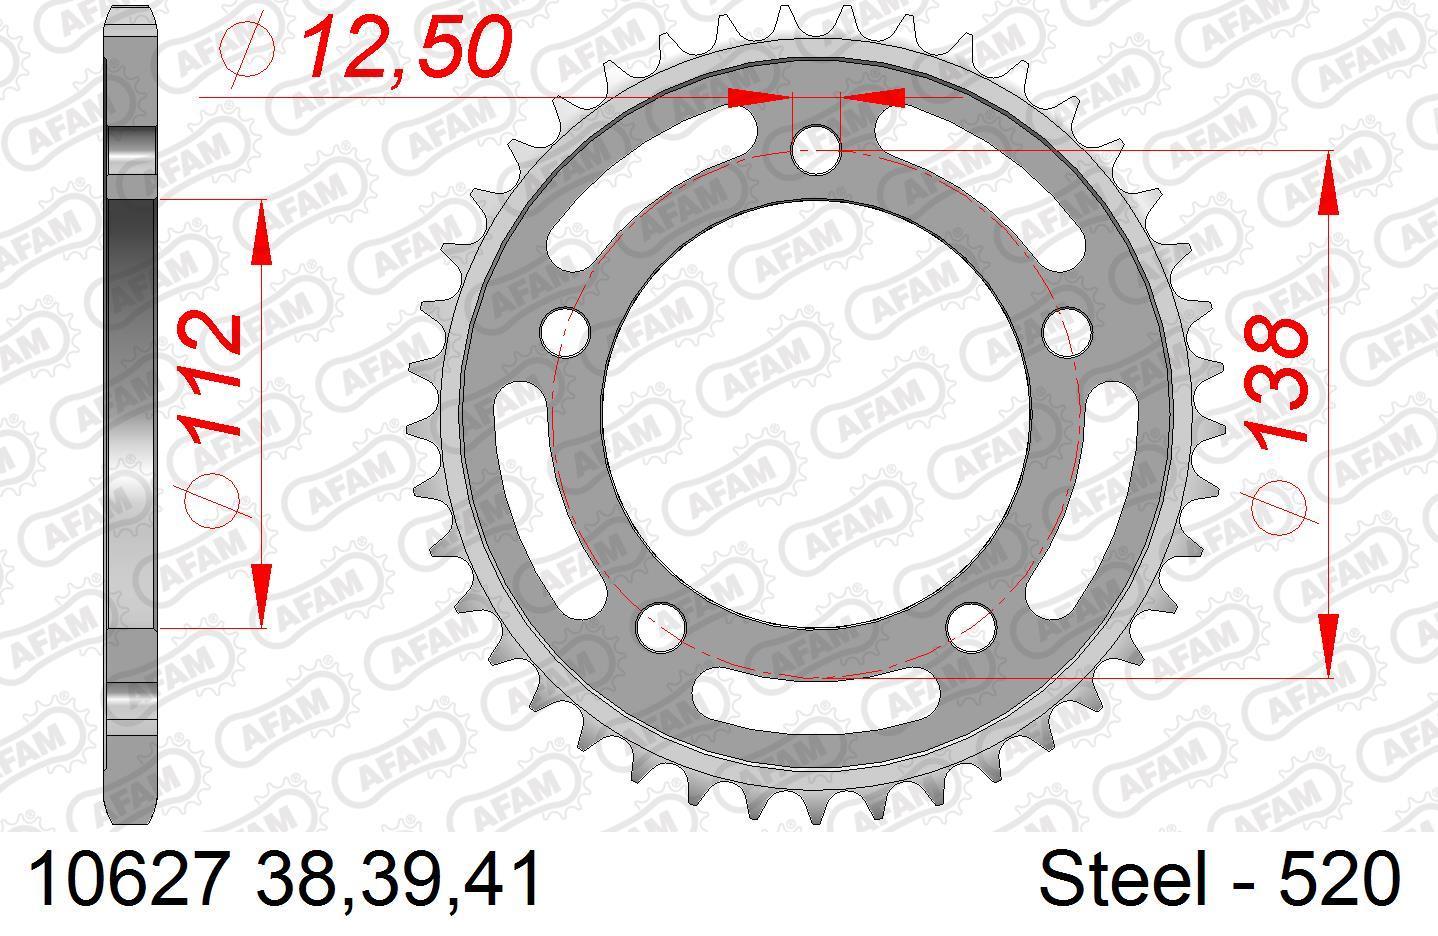 Motorrad Kettenrad 10627-41 Niedrige Preise - Jetzt kaufen!